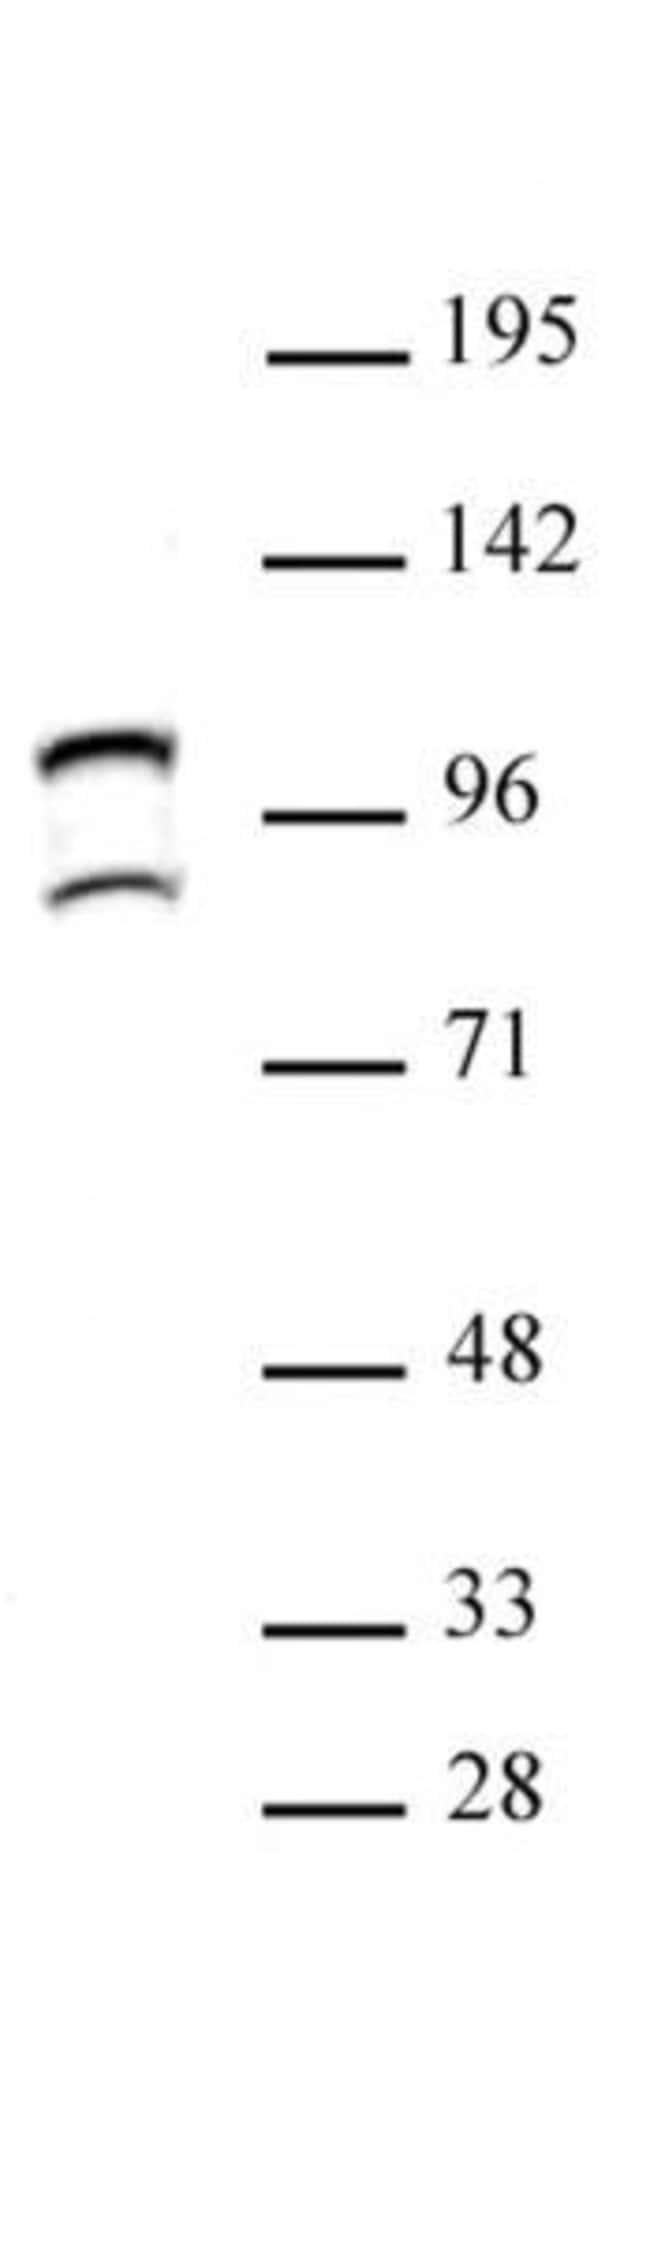 STAT6 Rabbit anti-Human, Unconjugated, Polyclonal, Active Motif:Antibodies:Primary